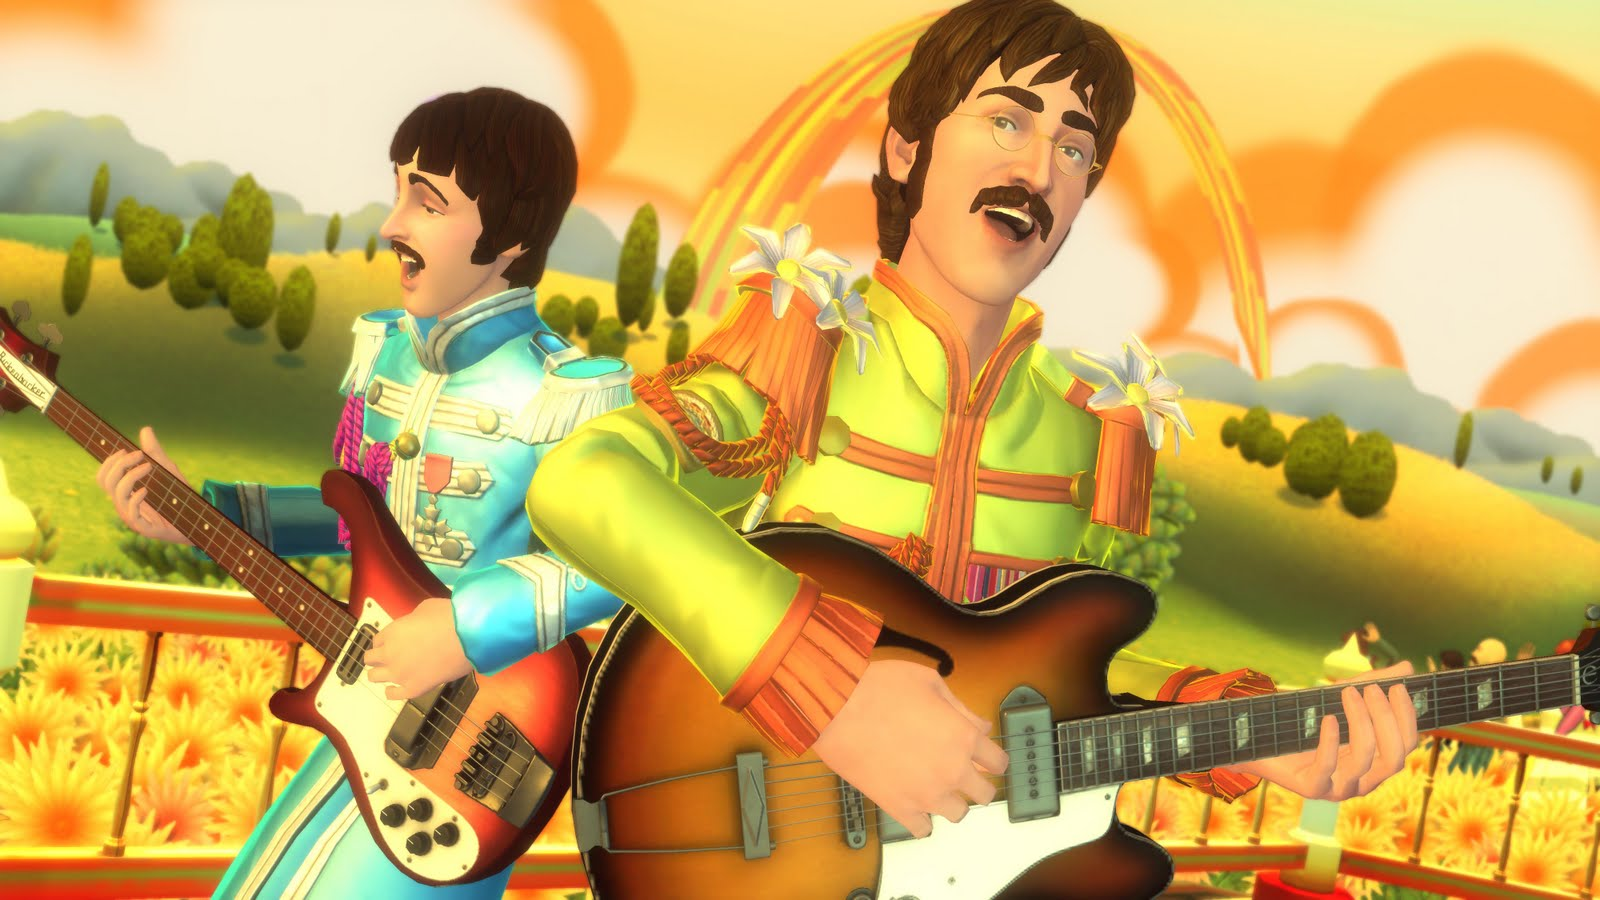 http://2.bp.blogspot.com/_KfYTZSzjT7A/SwN-qkvqnpI/AAAAAAAAAYk/x66Eksdu0ho/s1600/Sgt_Pepper.jpg